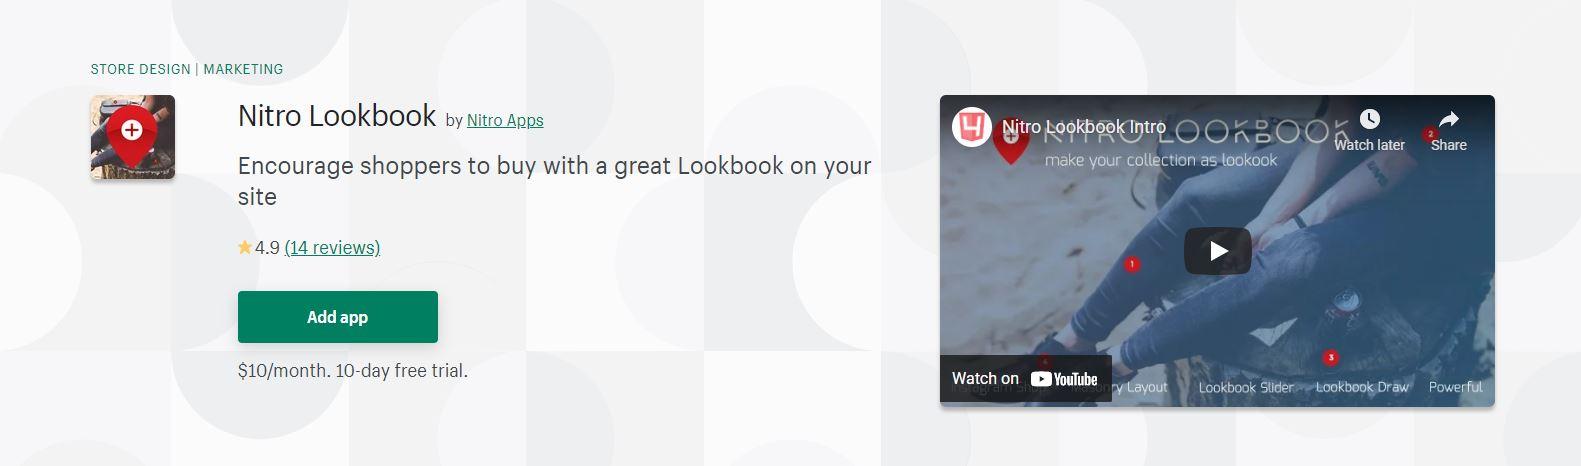 Nitro Lookbook